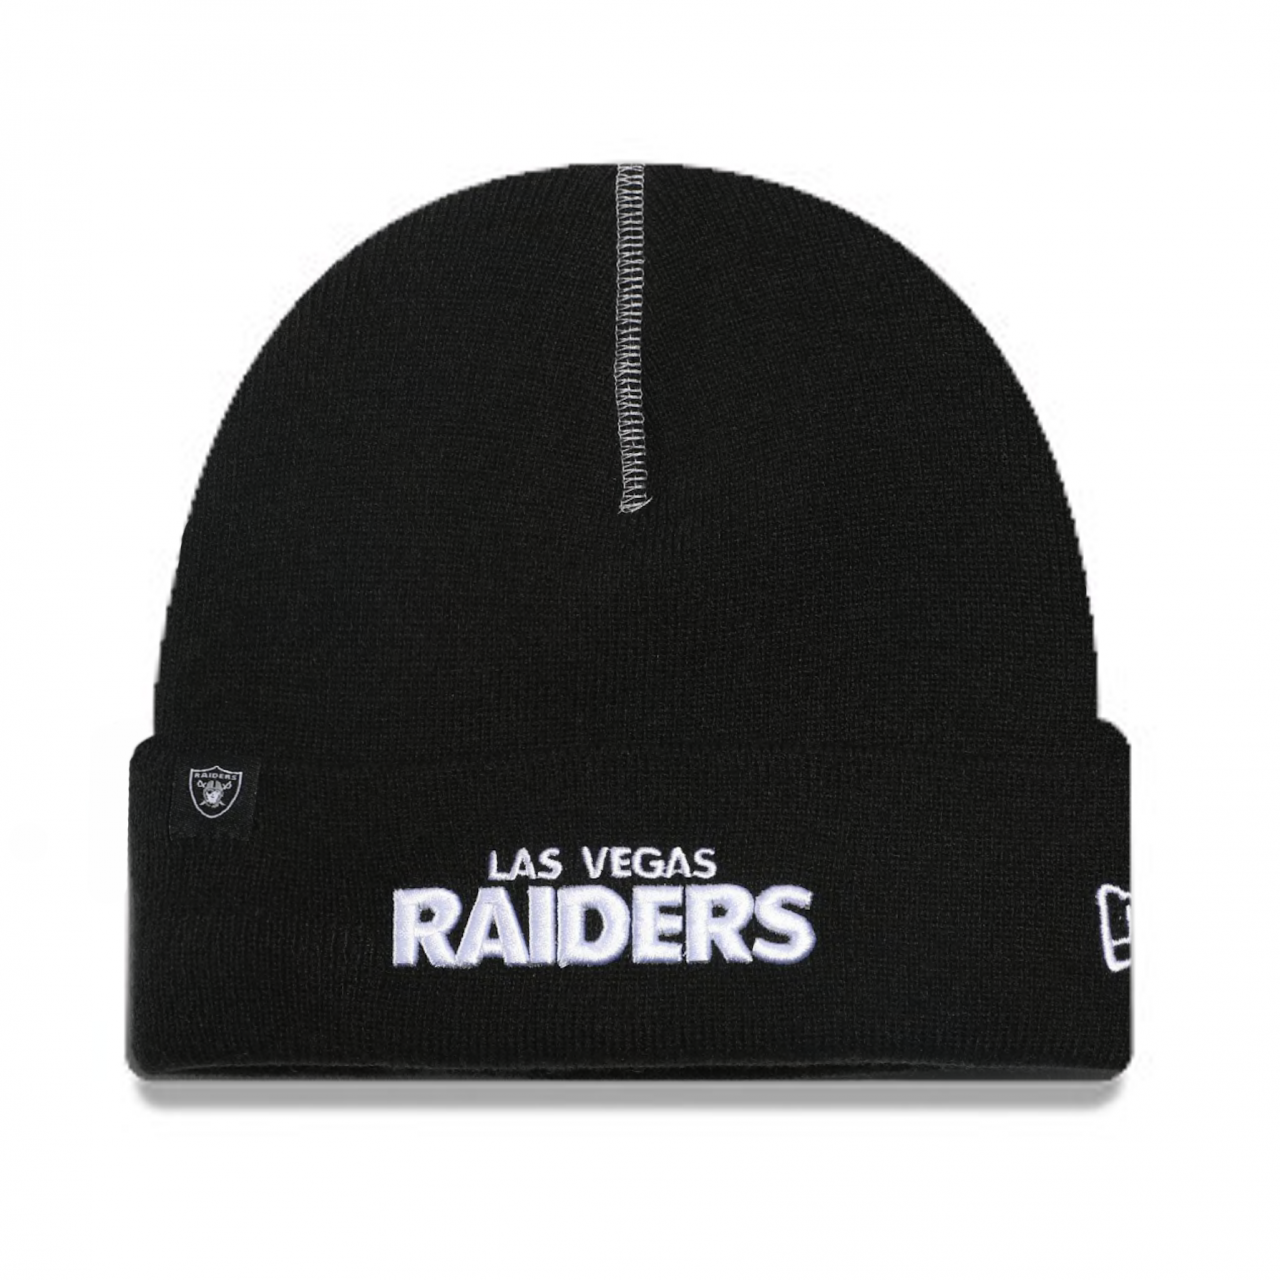 60068521 NFL KNIT LAS VEGAS RAIDERS SCRIPT BLACK